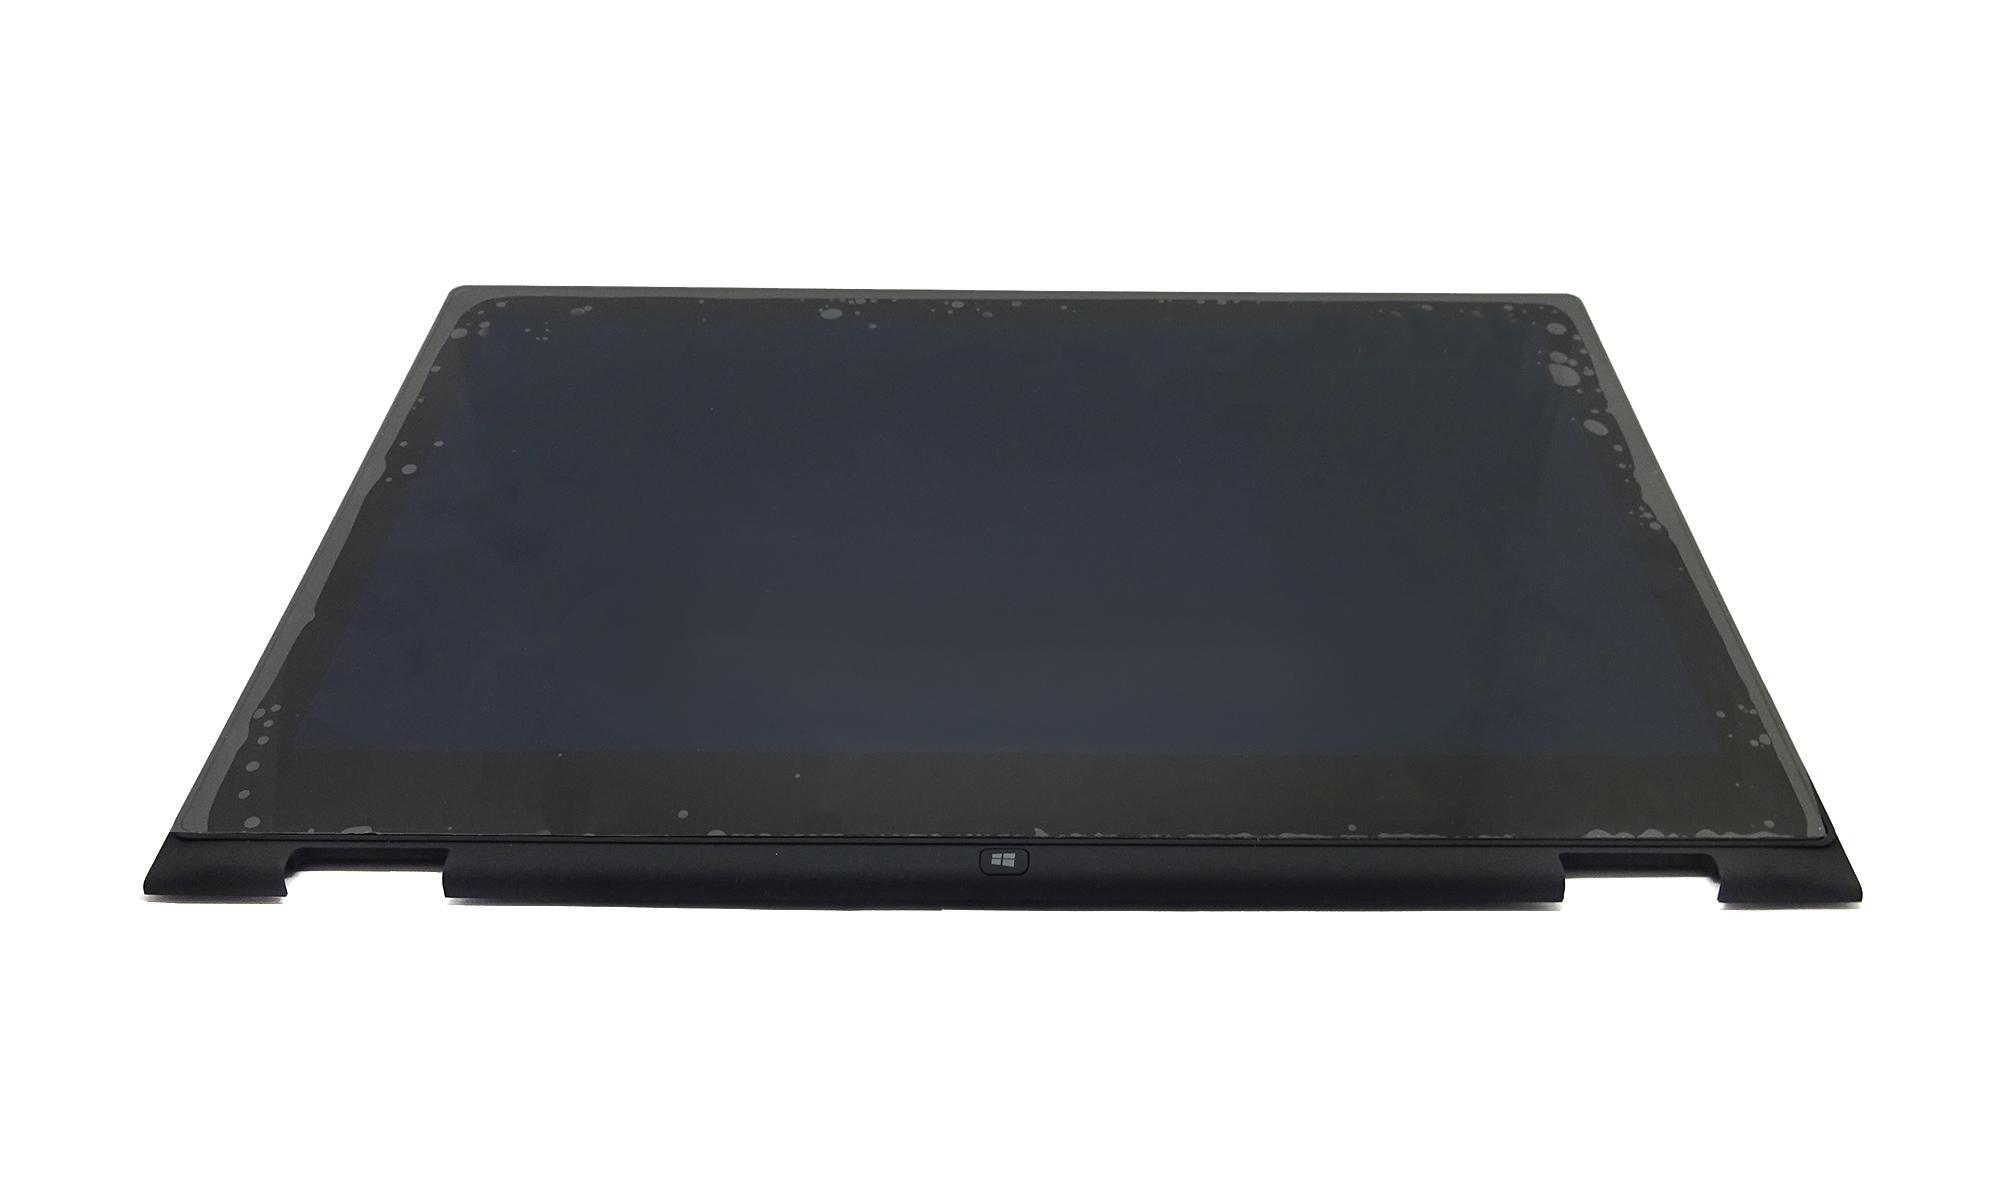 "Ansamblu Touchscreen original Dell Inspiron 13 7347 / 7348 / 7359 13.3"" Full HD 96XWH"